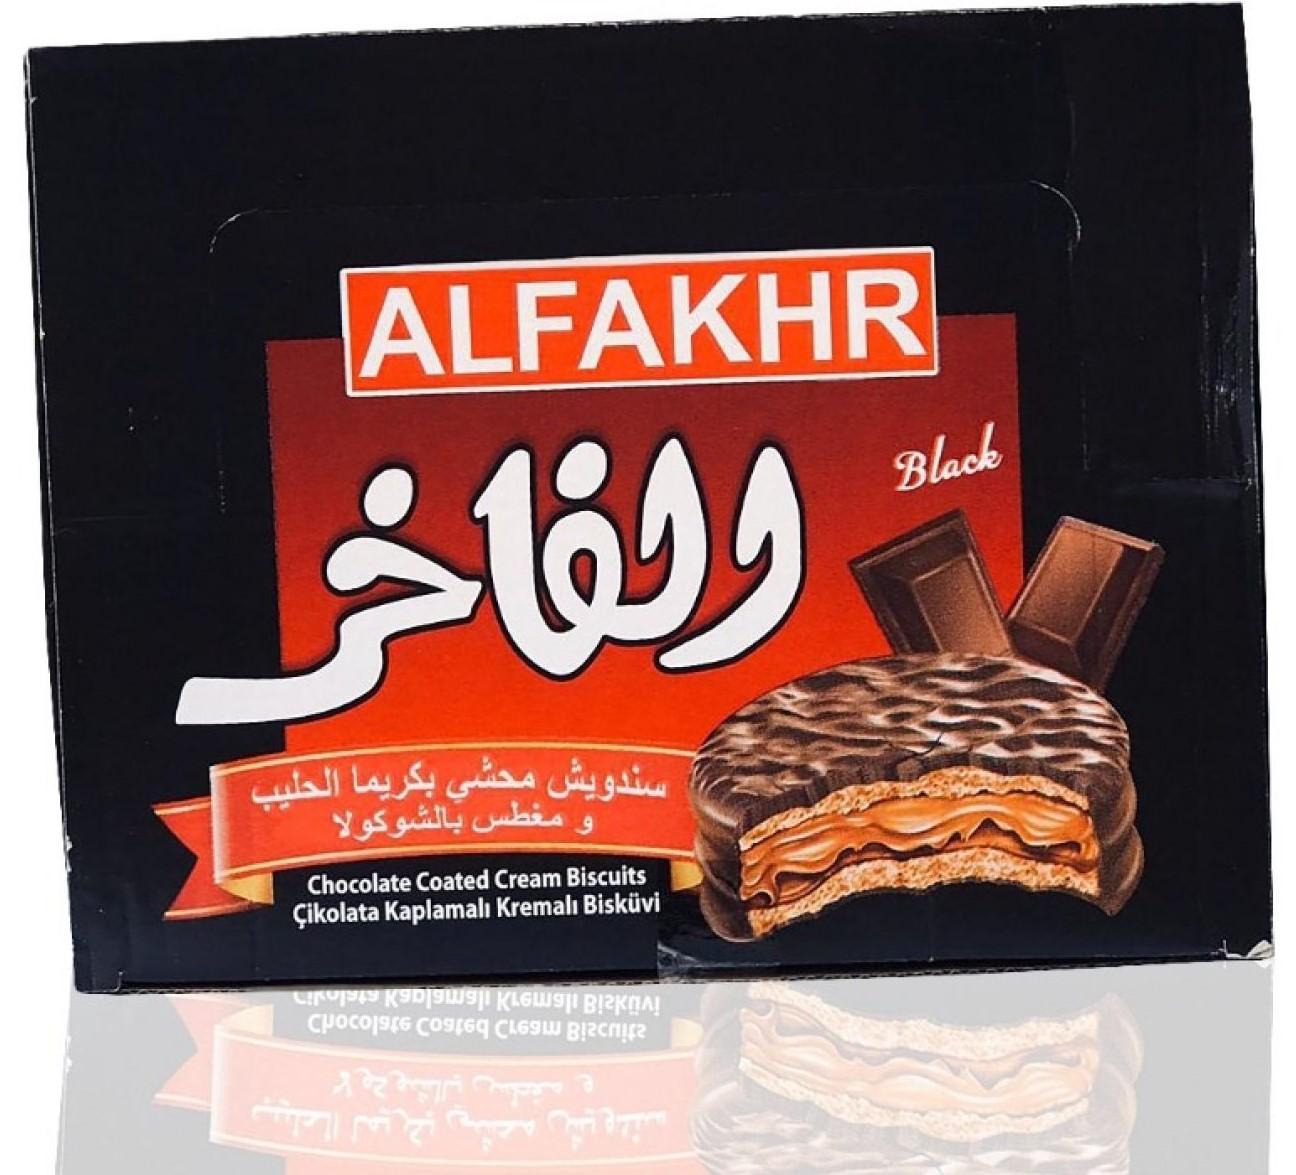 Alfakher Schokoladen Kekse mit creamiger Schokoladenfüllung 24x30g (720g)  بسكويت شوكولا الفاخر 24 قطعة